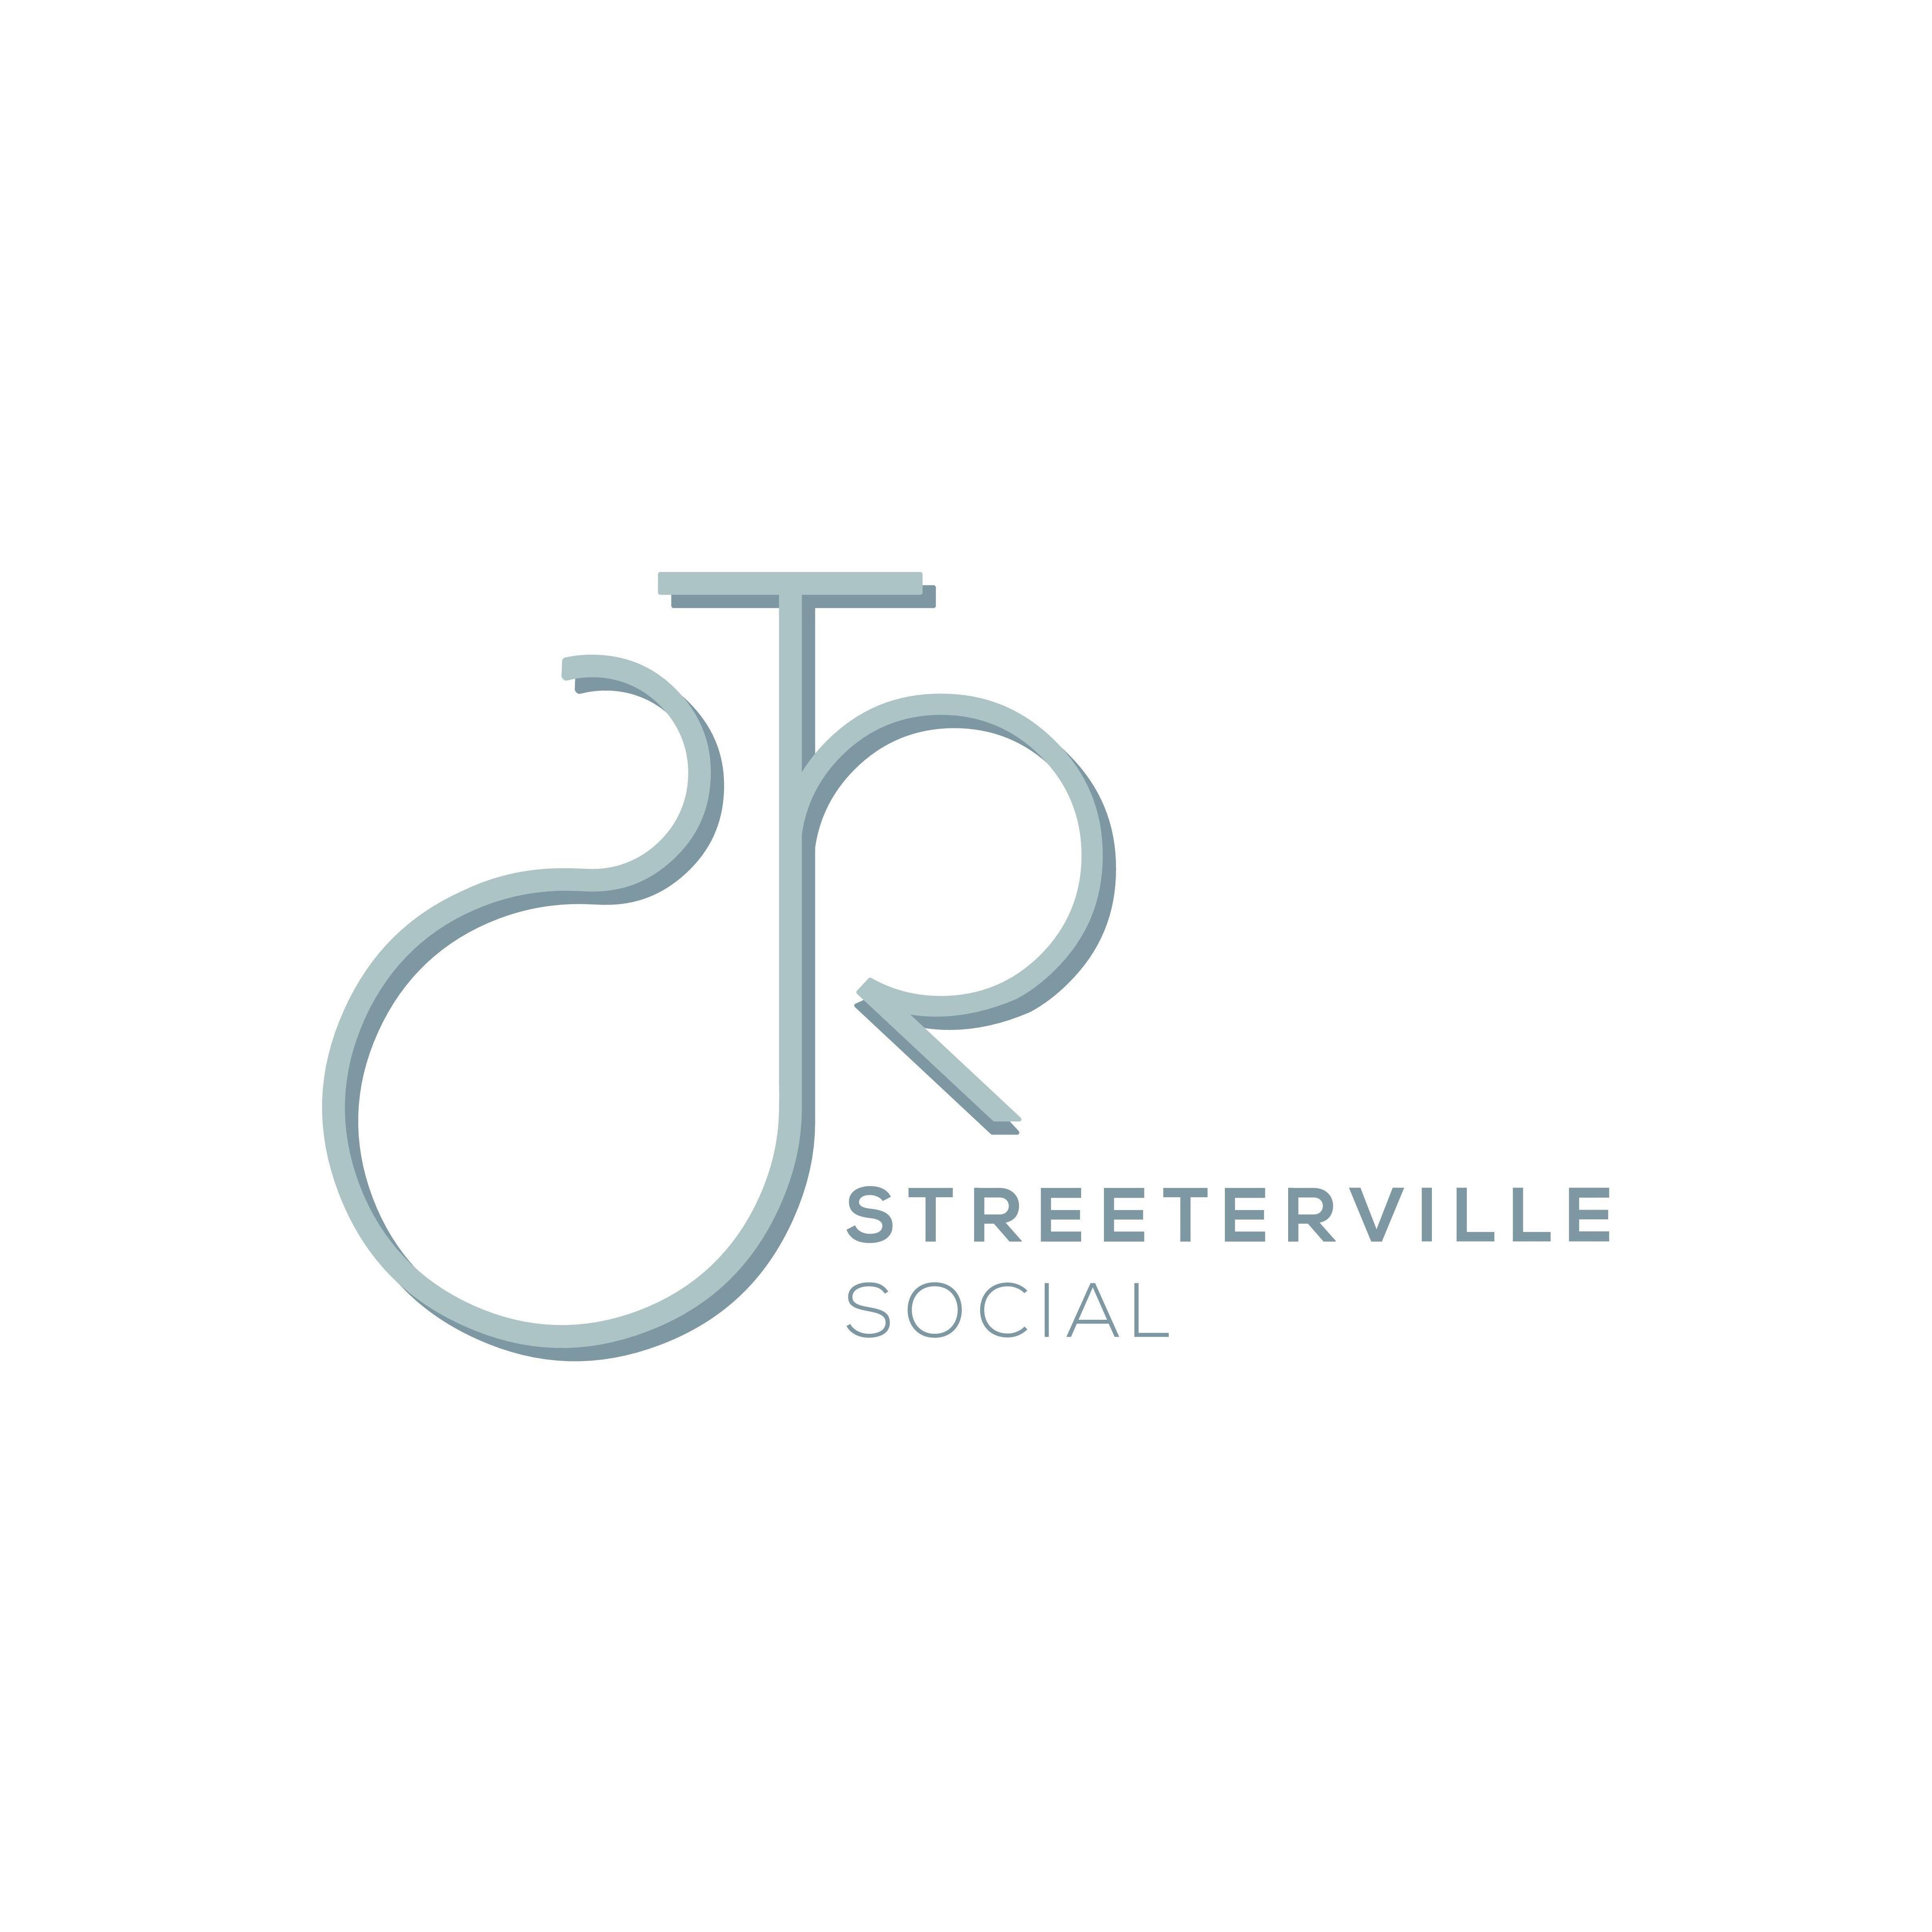 Streeterville Social